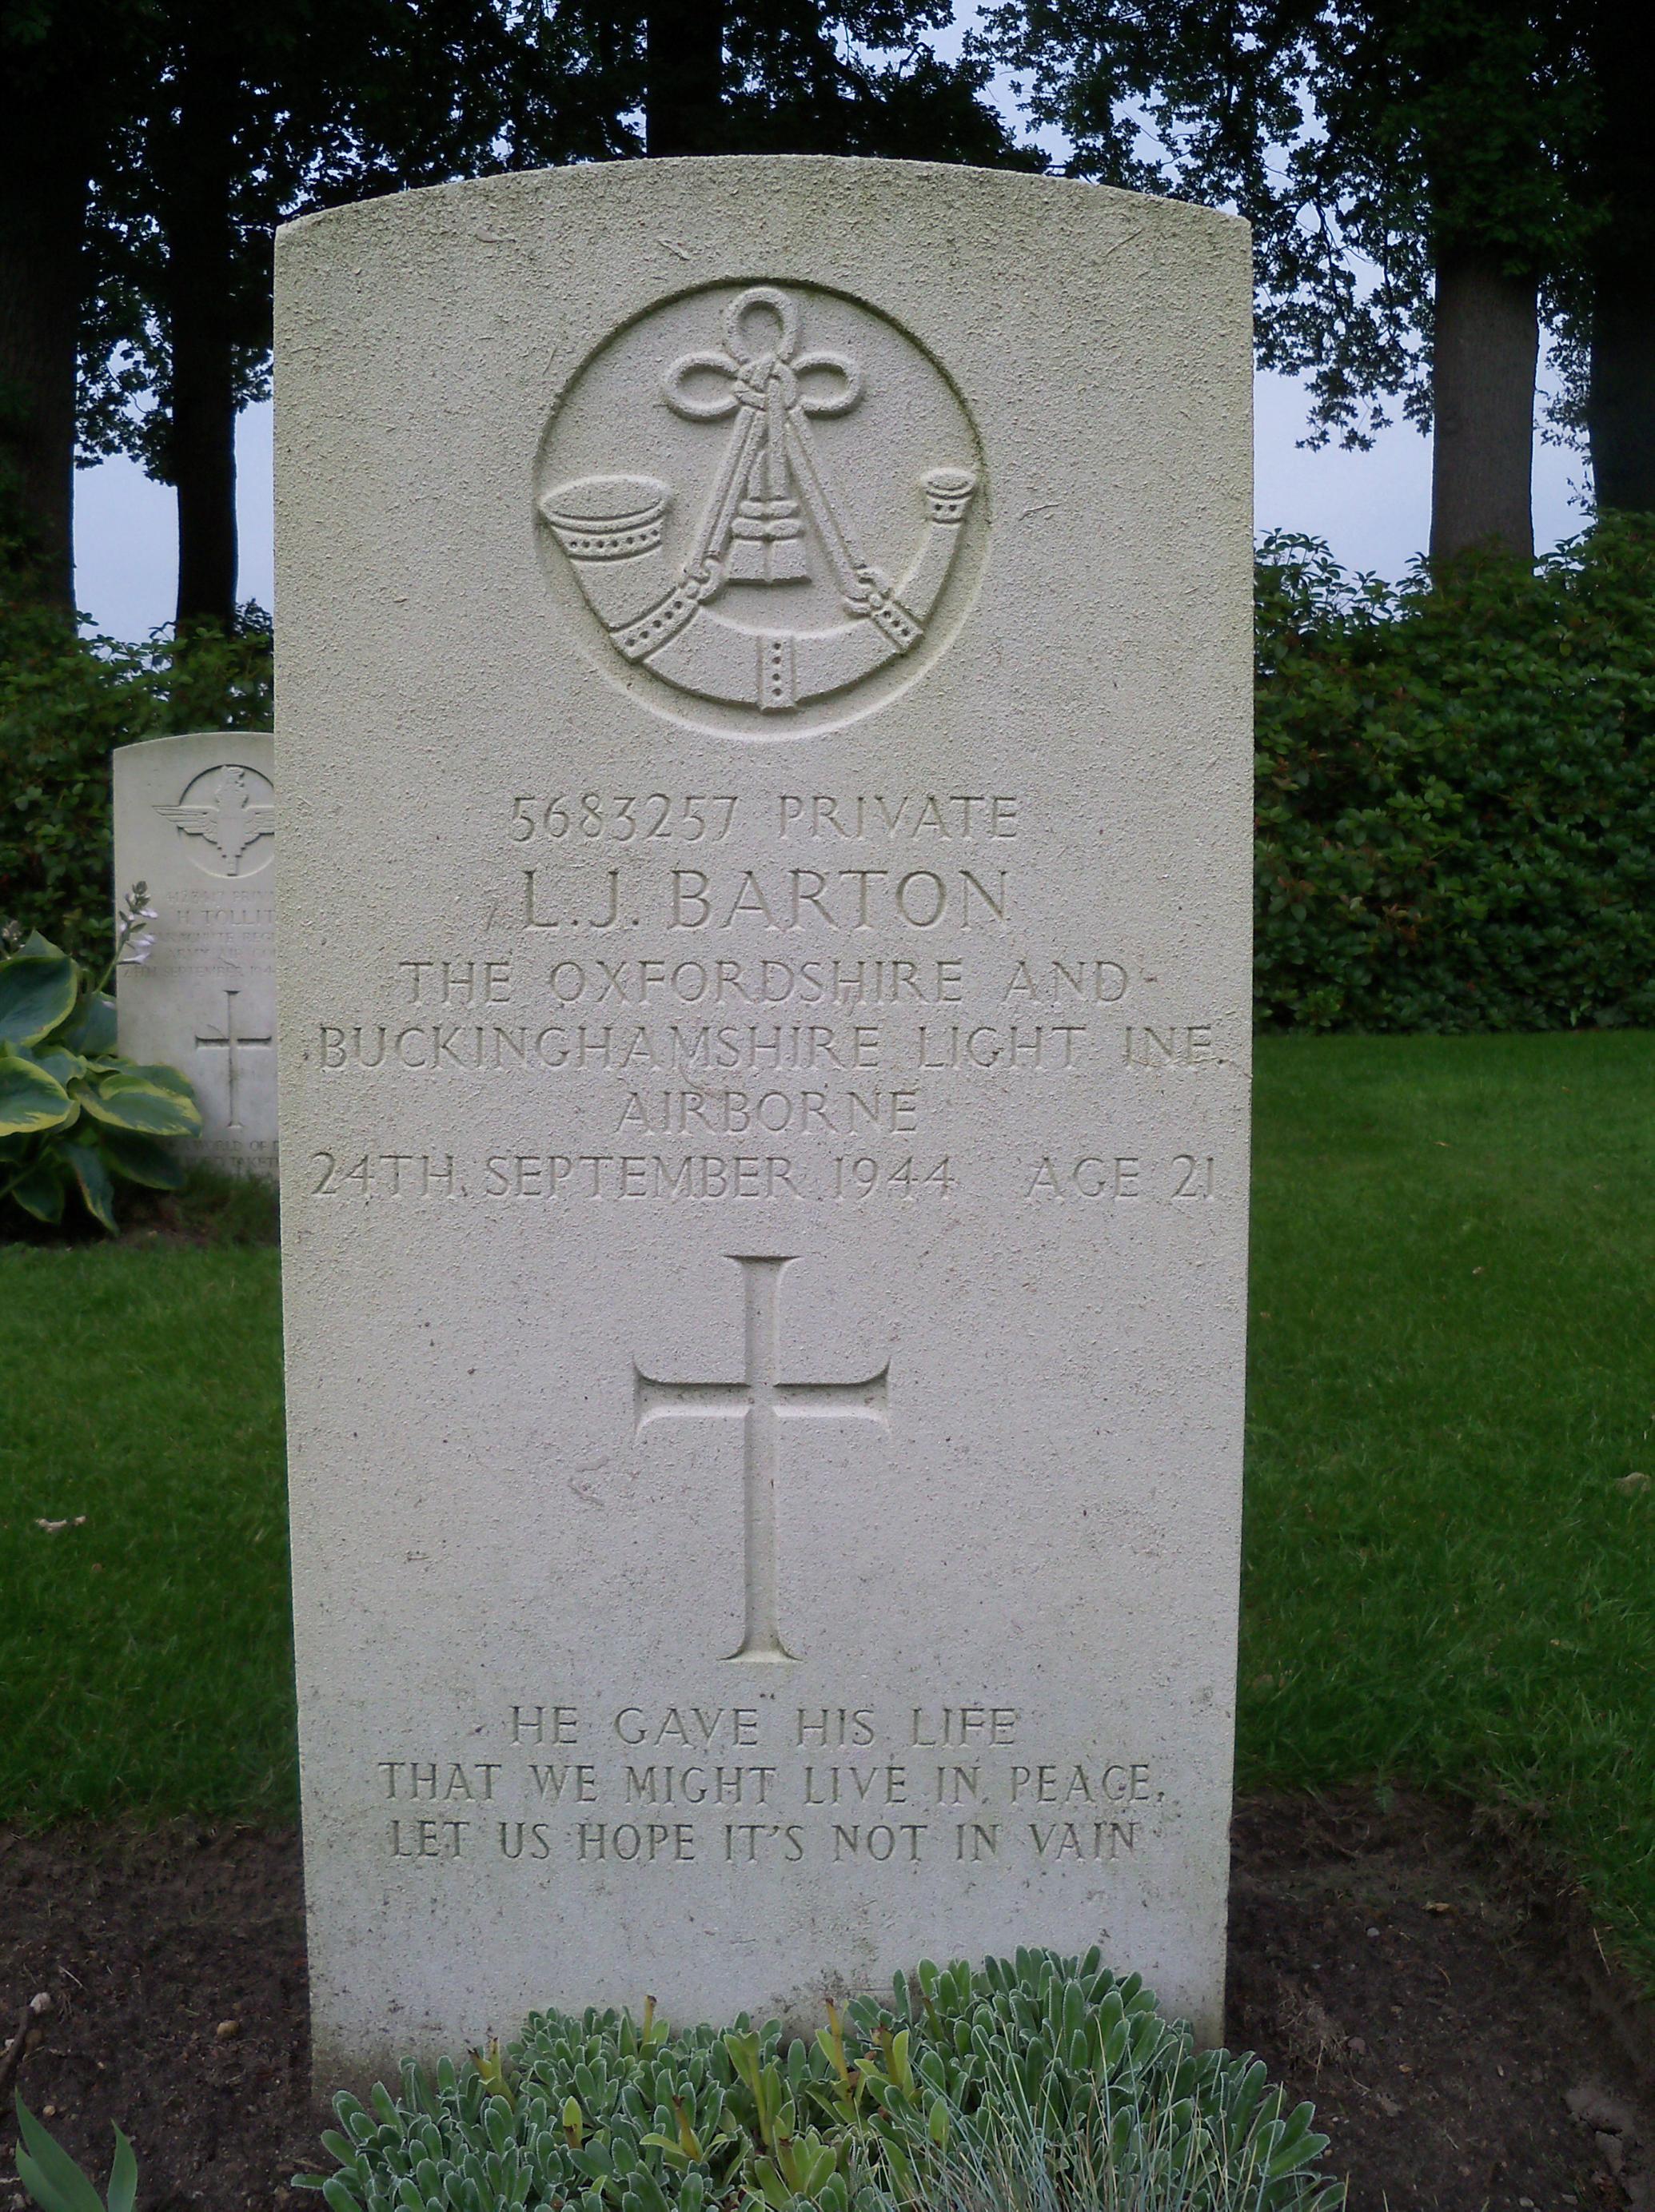 Grave of Pte L J Barton (24 Sept 1944)